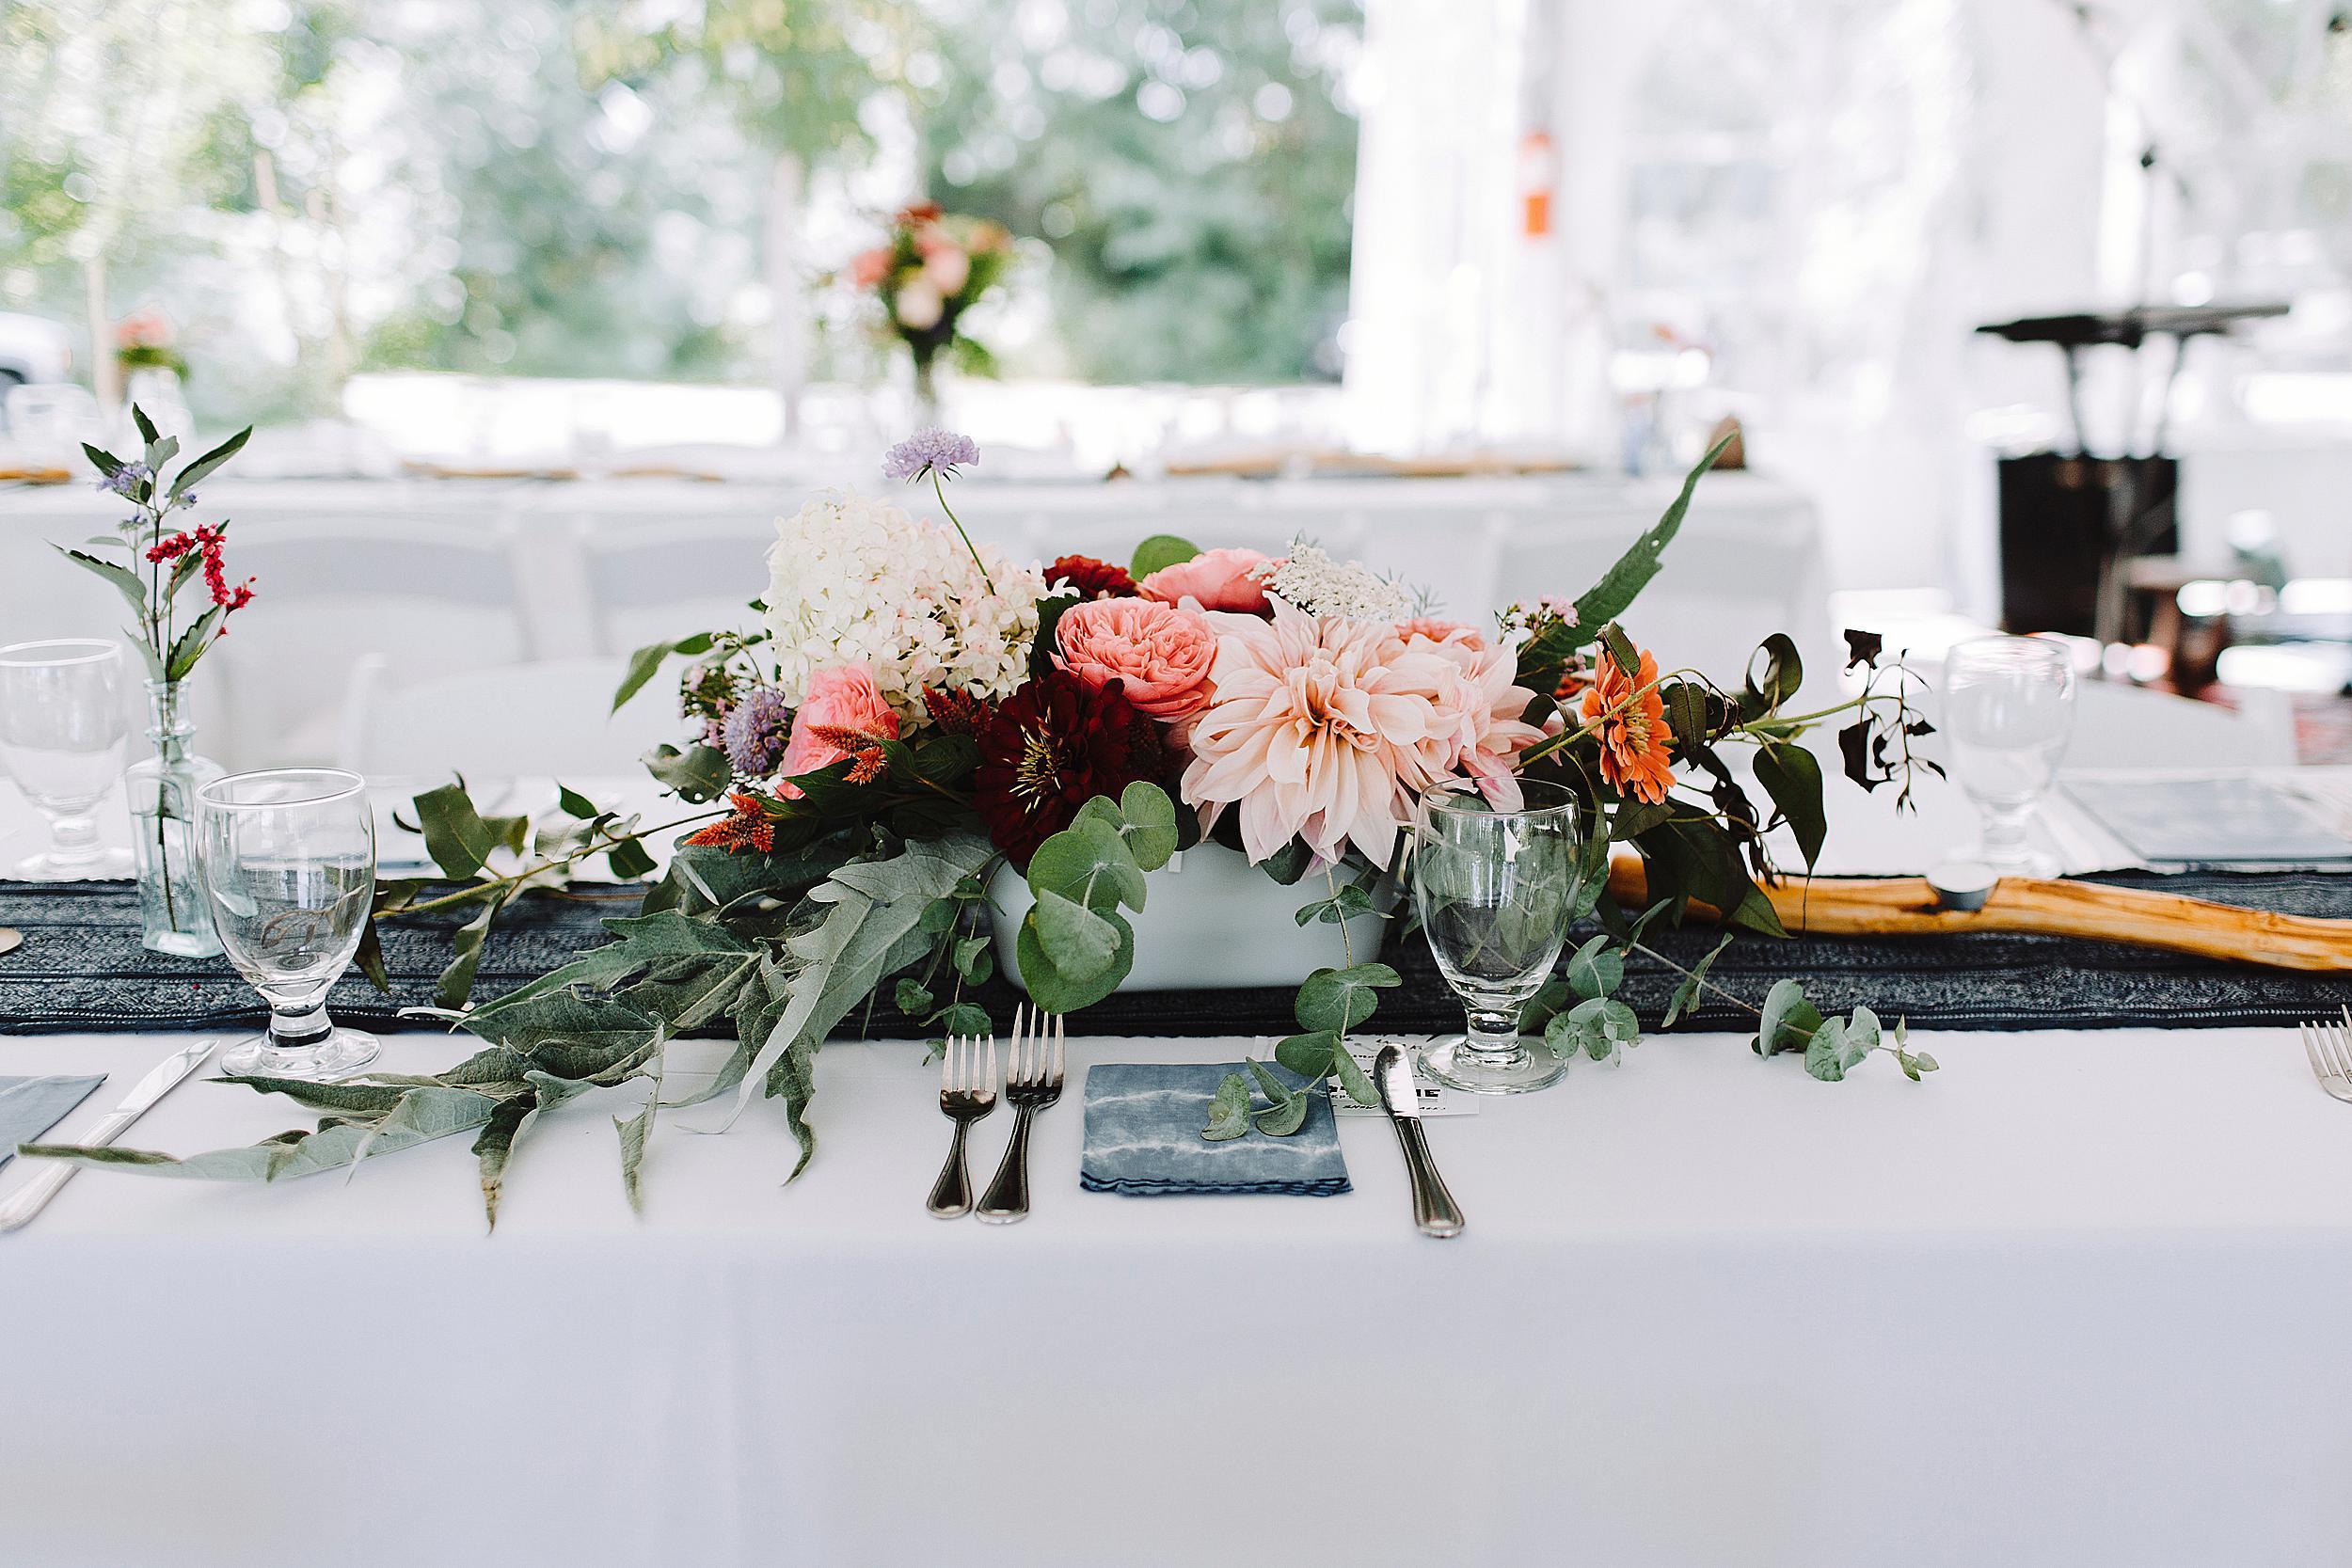 historic_shady_lane_wedding_with_love_and_embers-012.JPG